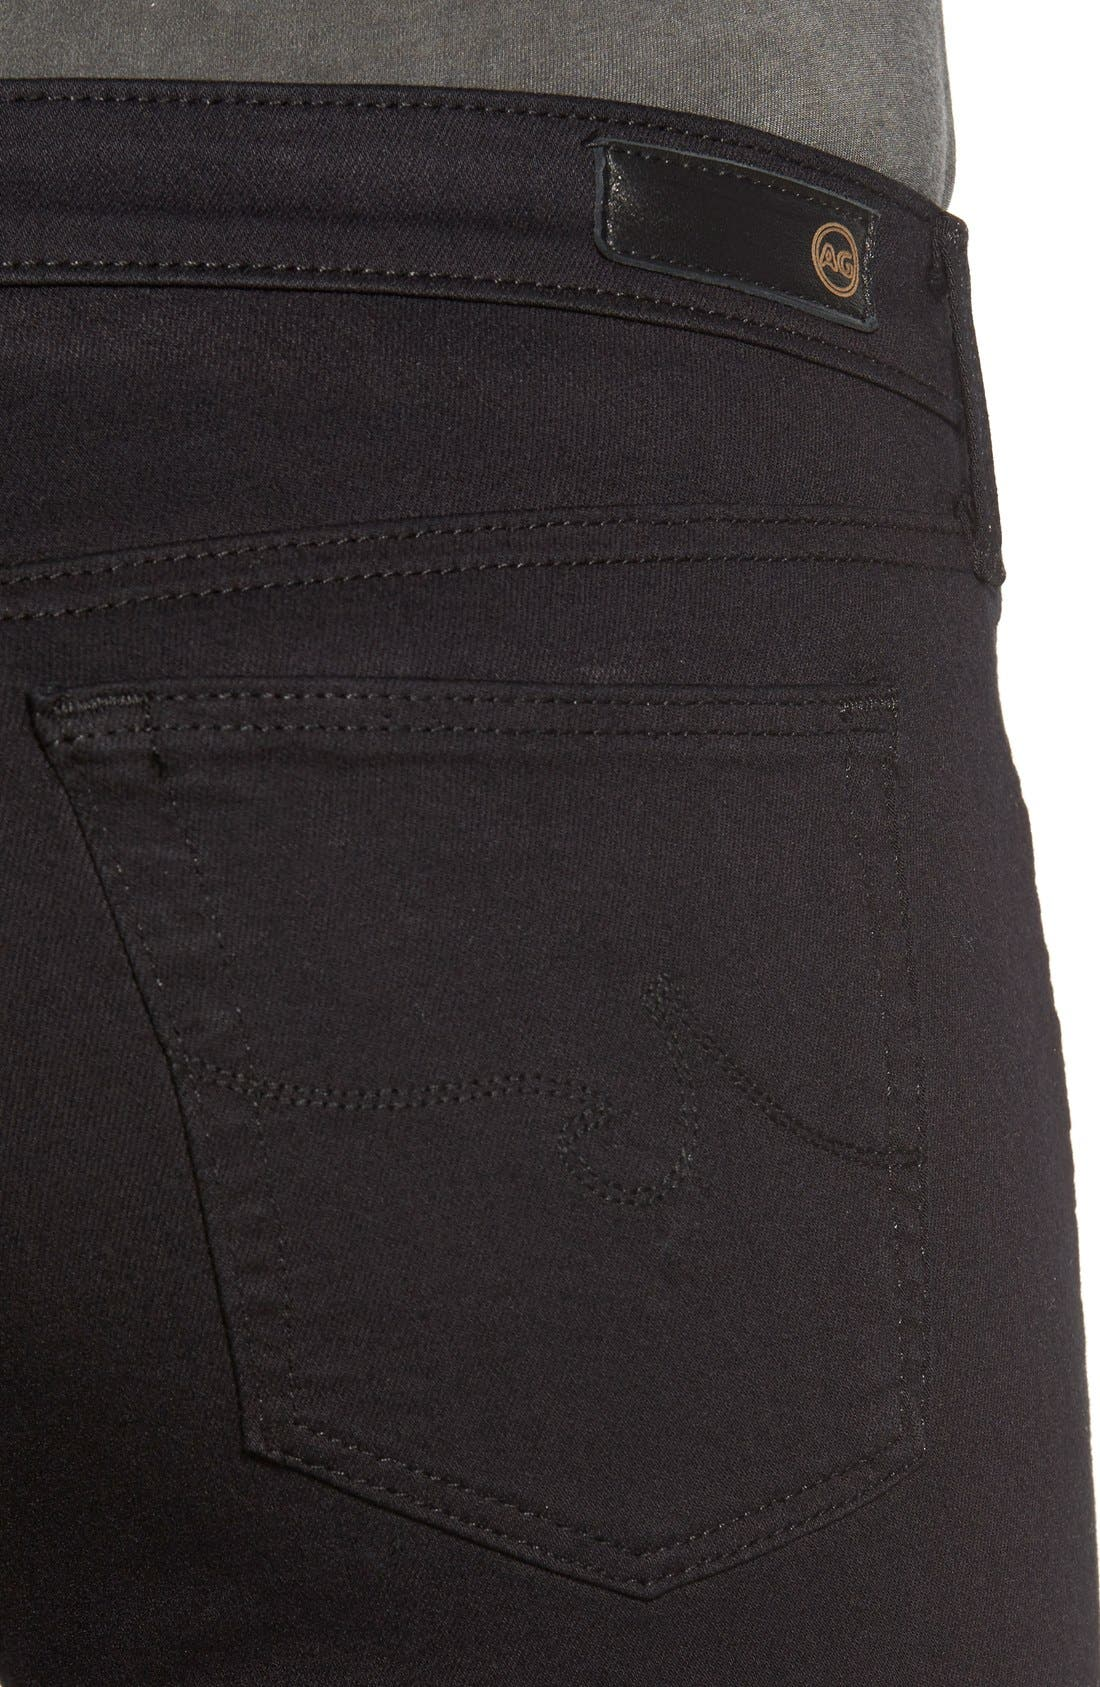 Alternate Image 4  - AG 'The Legging' Ankle Super Skinny Jeans (Super Black)